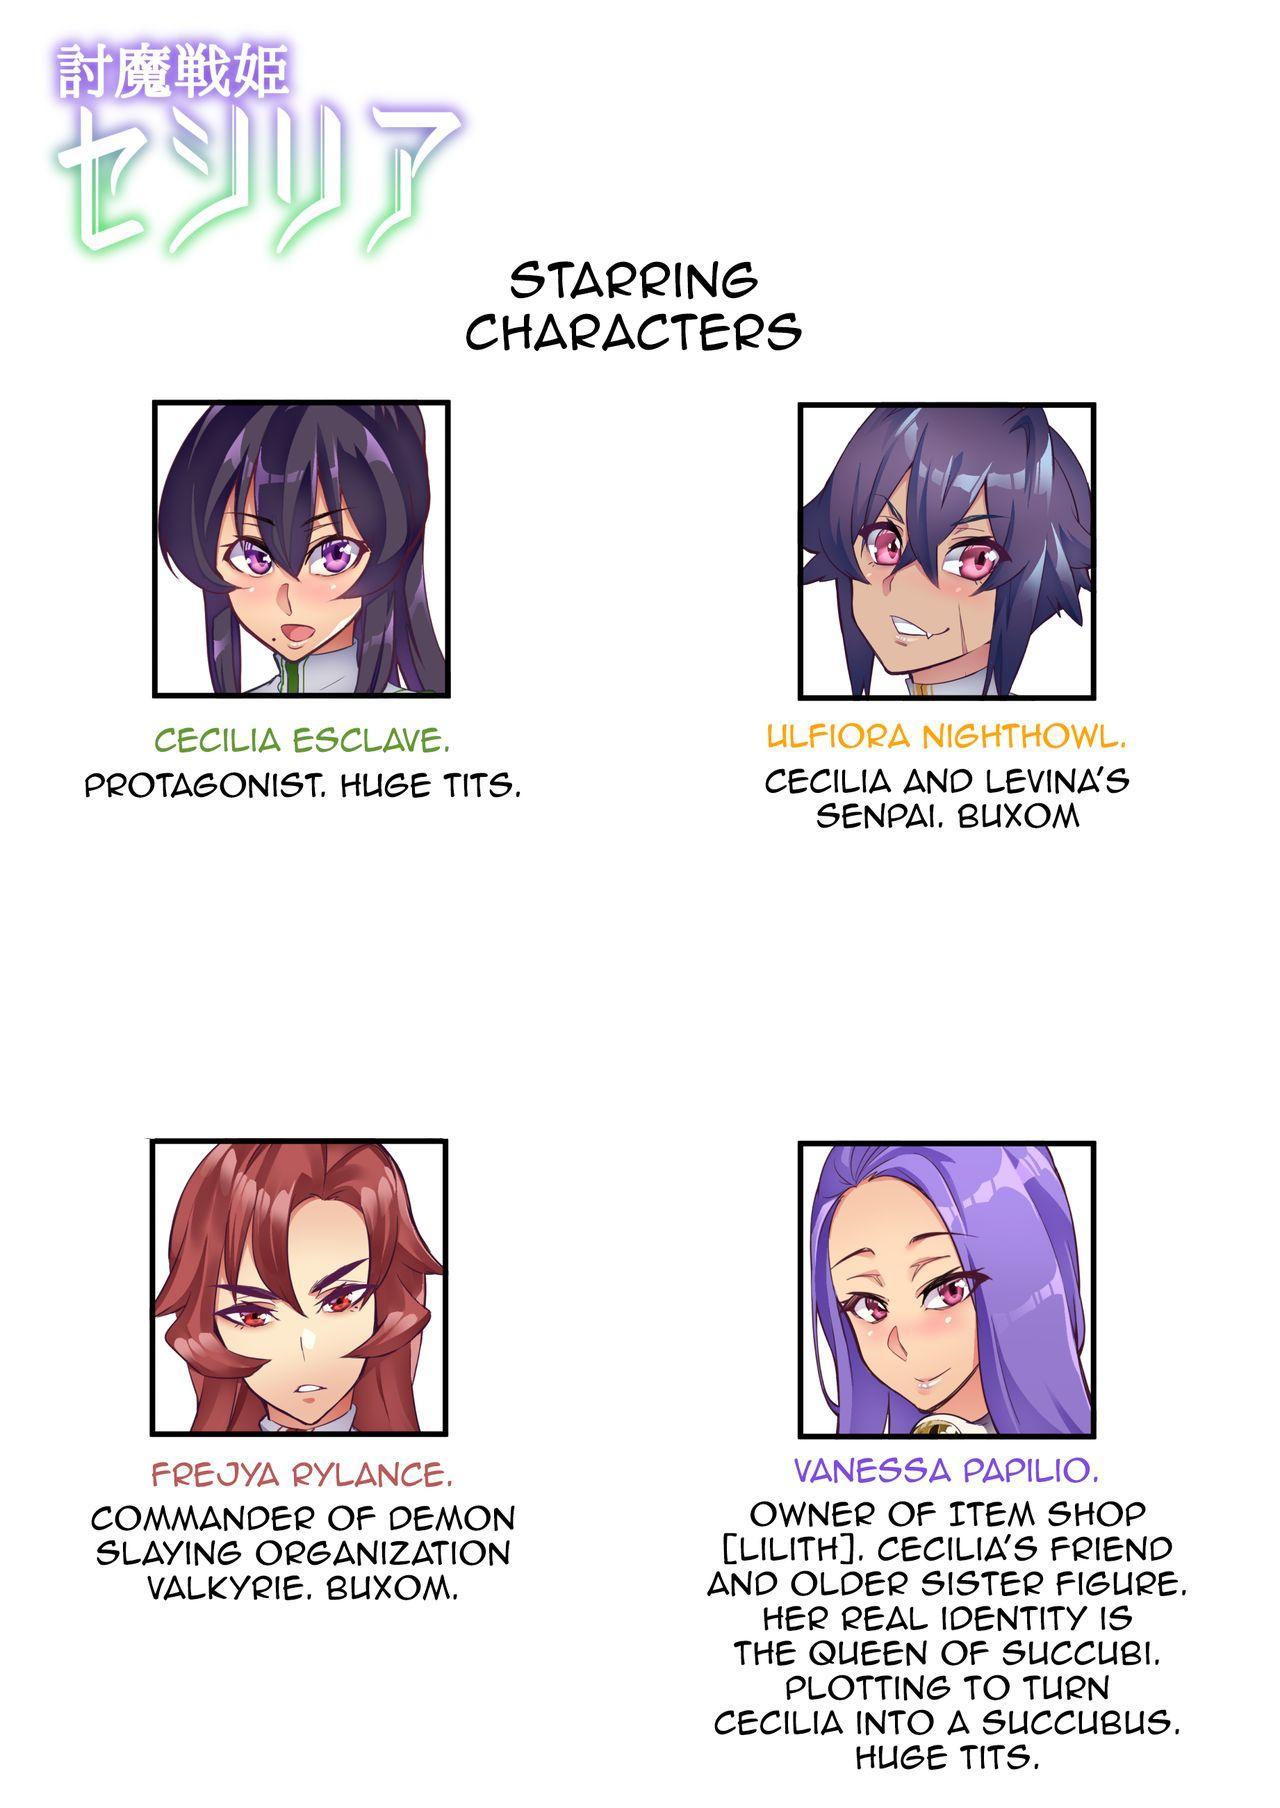 [Hatoba Akane] Demon Slaying Battle Princess Cecilia Ch. 1-8   Touma Senki Cecilia Ch. 1-8 [English] {EL JEFE Hentai Truck} 51